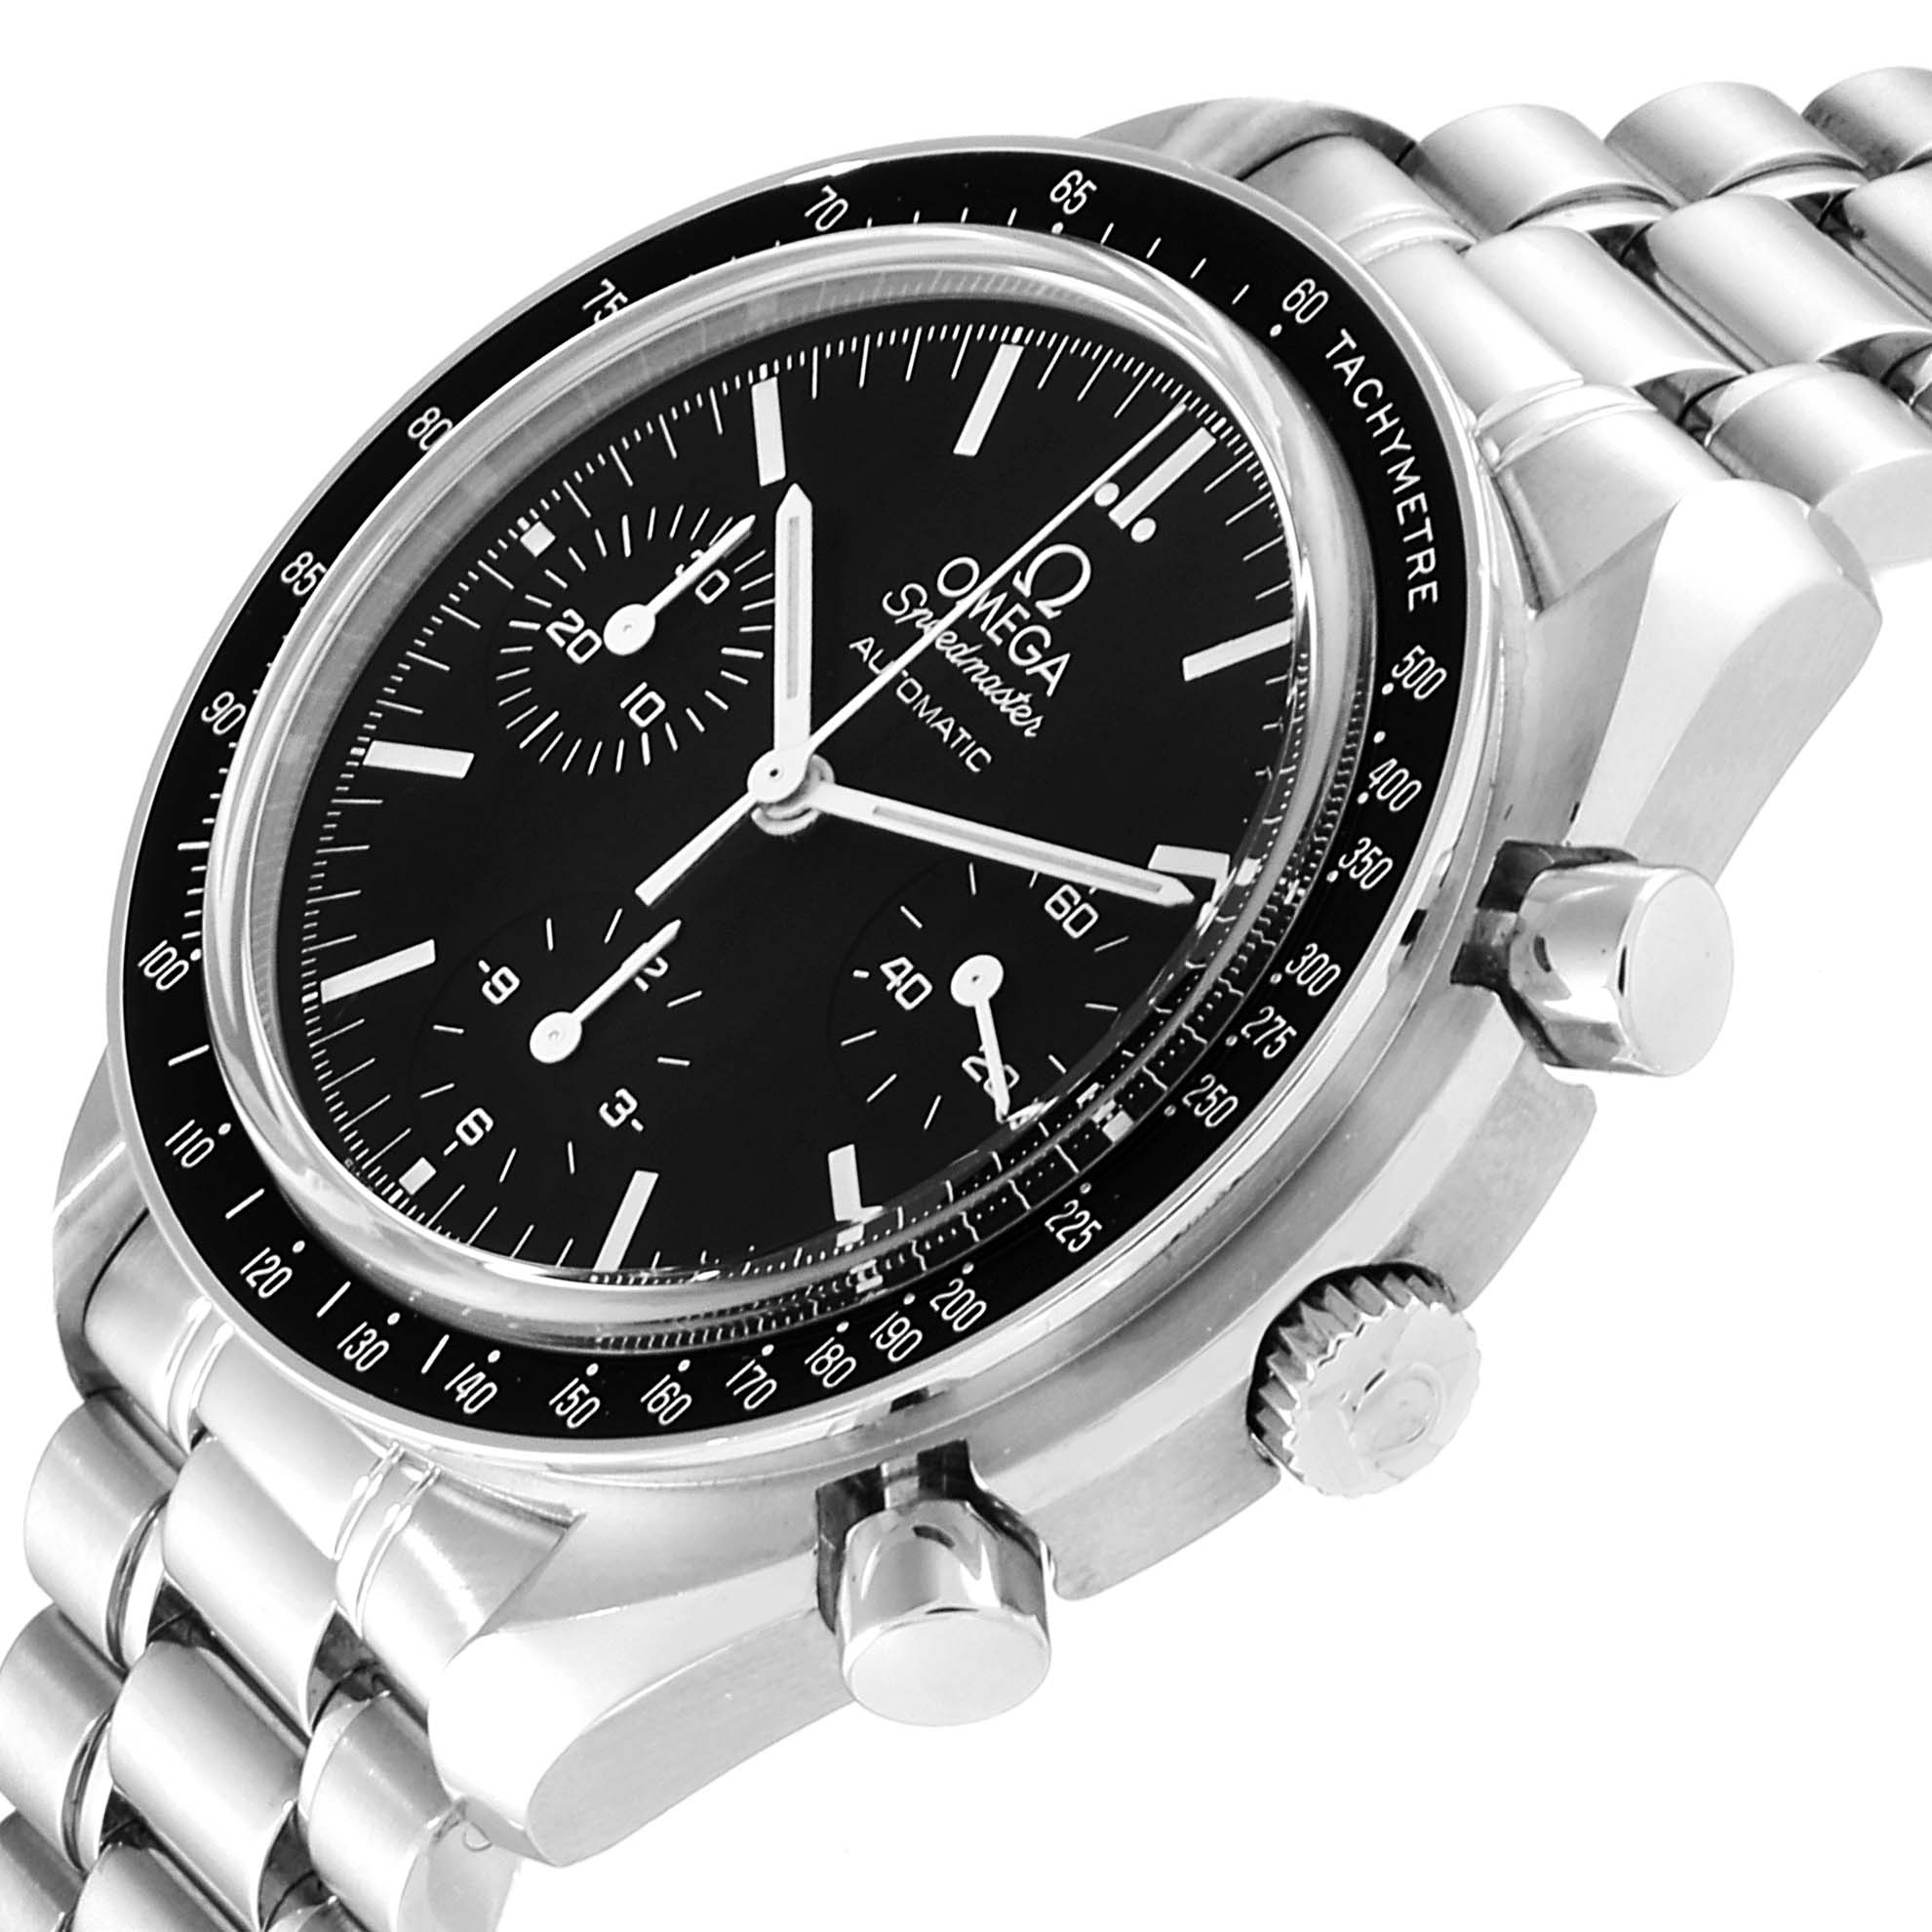 Omega Speedmaster Chrono Reduced Automatic Steel Watch 3539.50.00 SwissWatchExpo